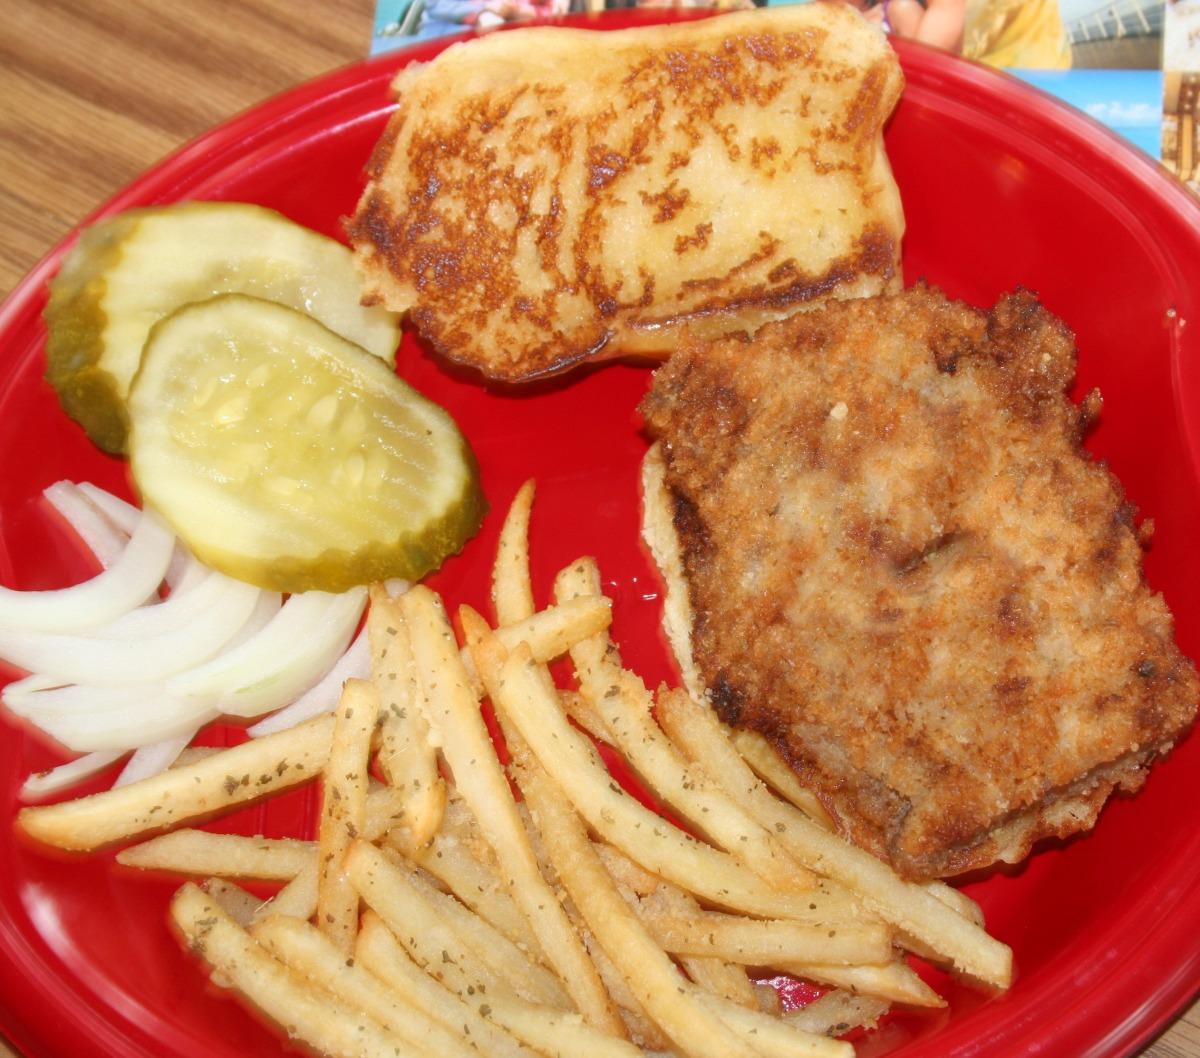 Fried Pork Tenderloin Sandwich (A Midwest Favorite)